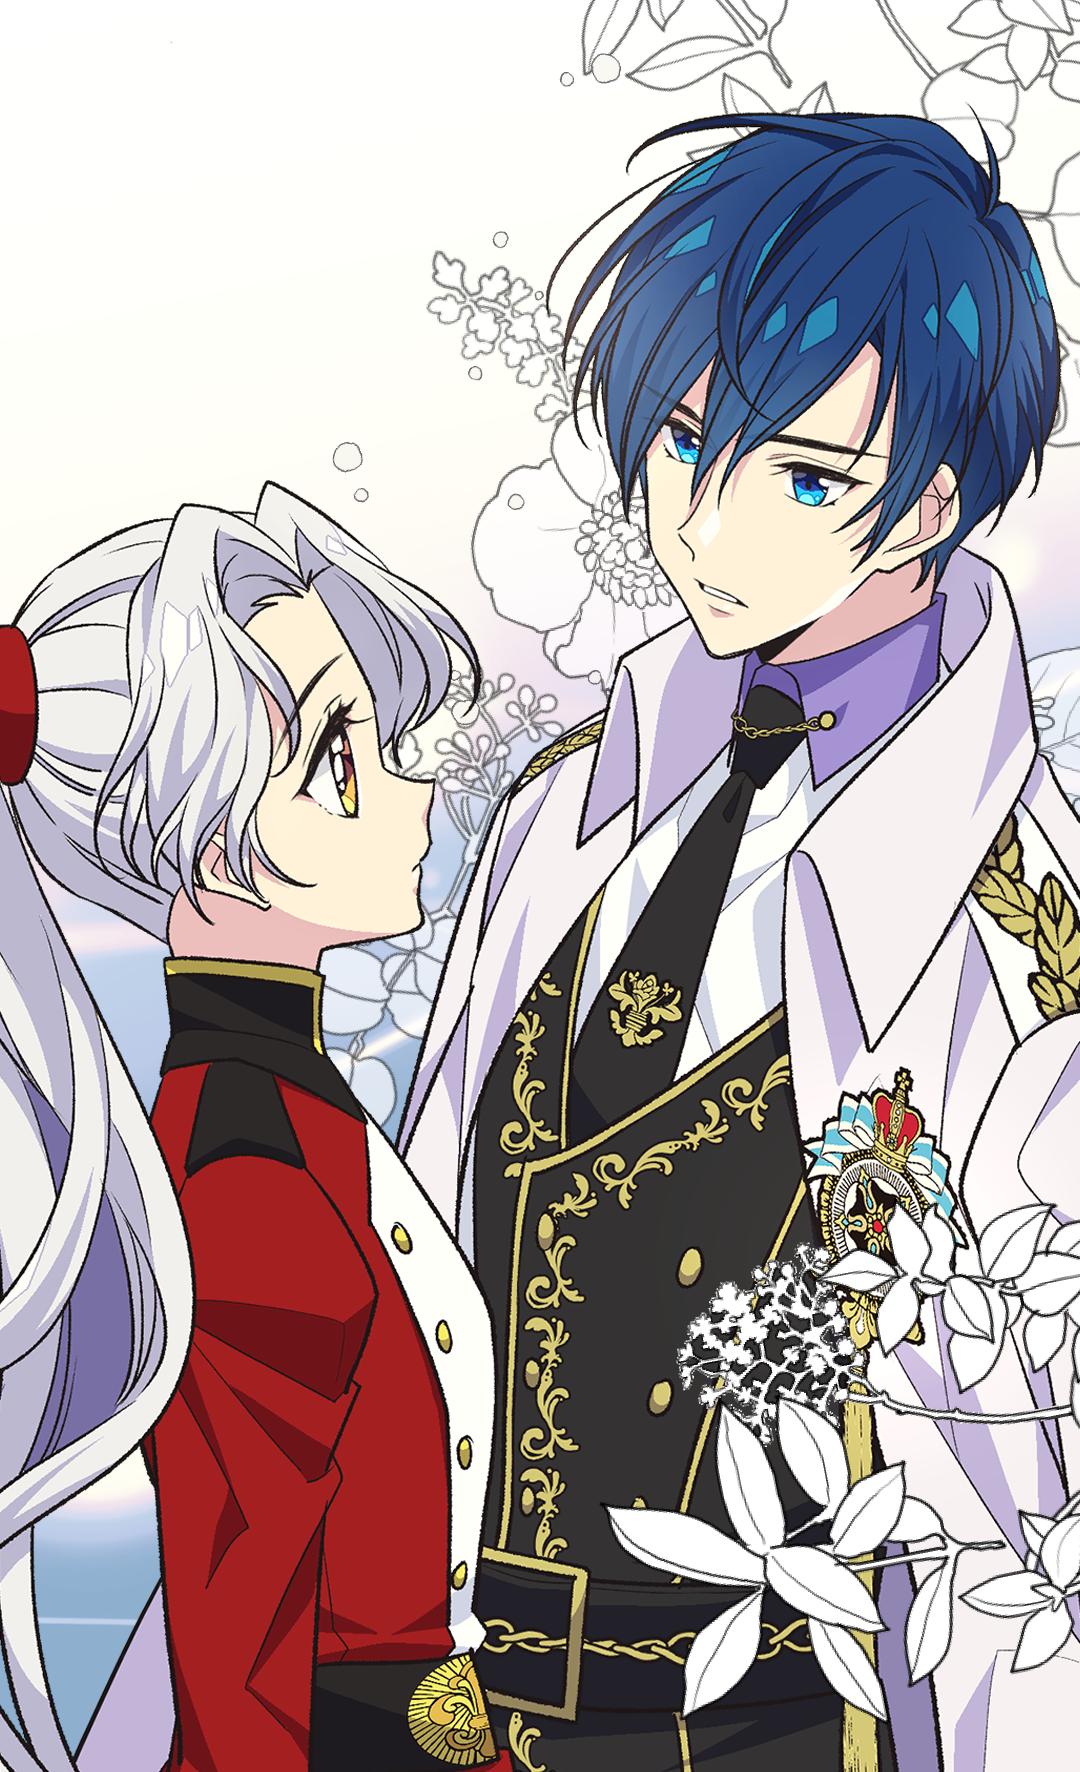 Tappytoon comics webtoon anime Romance Fantasy